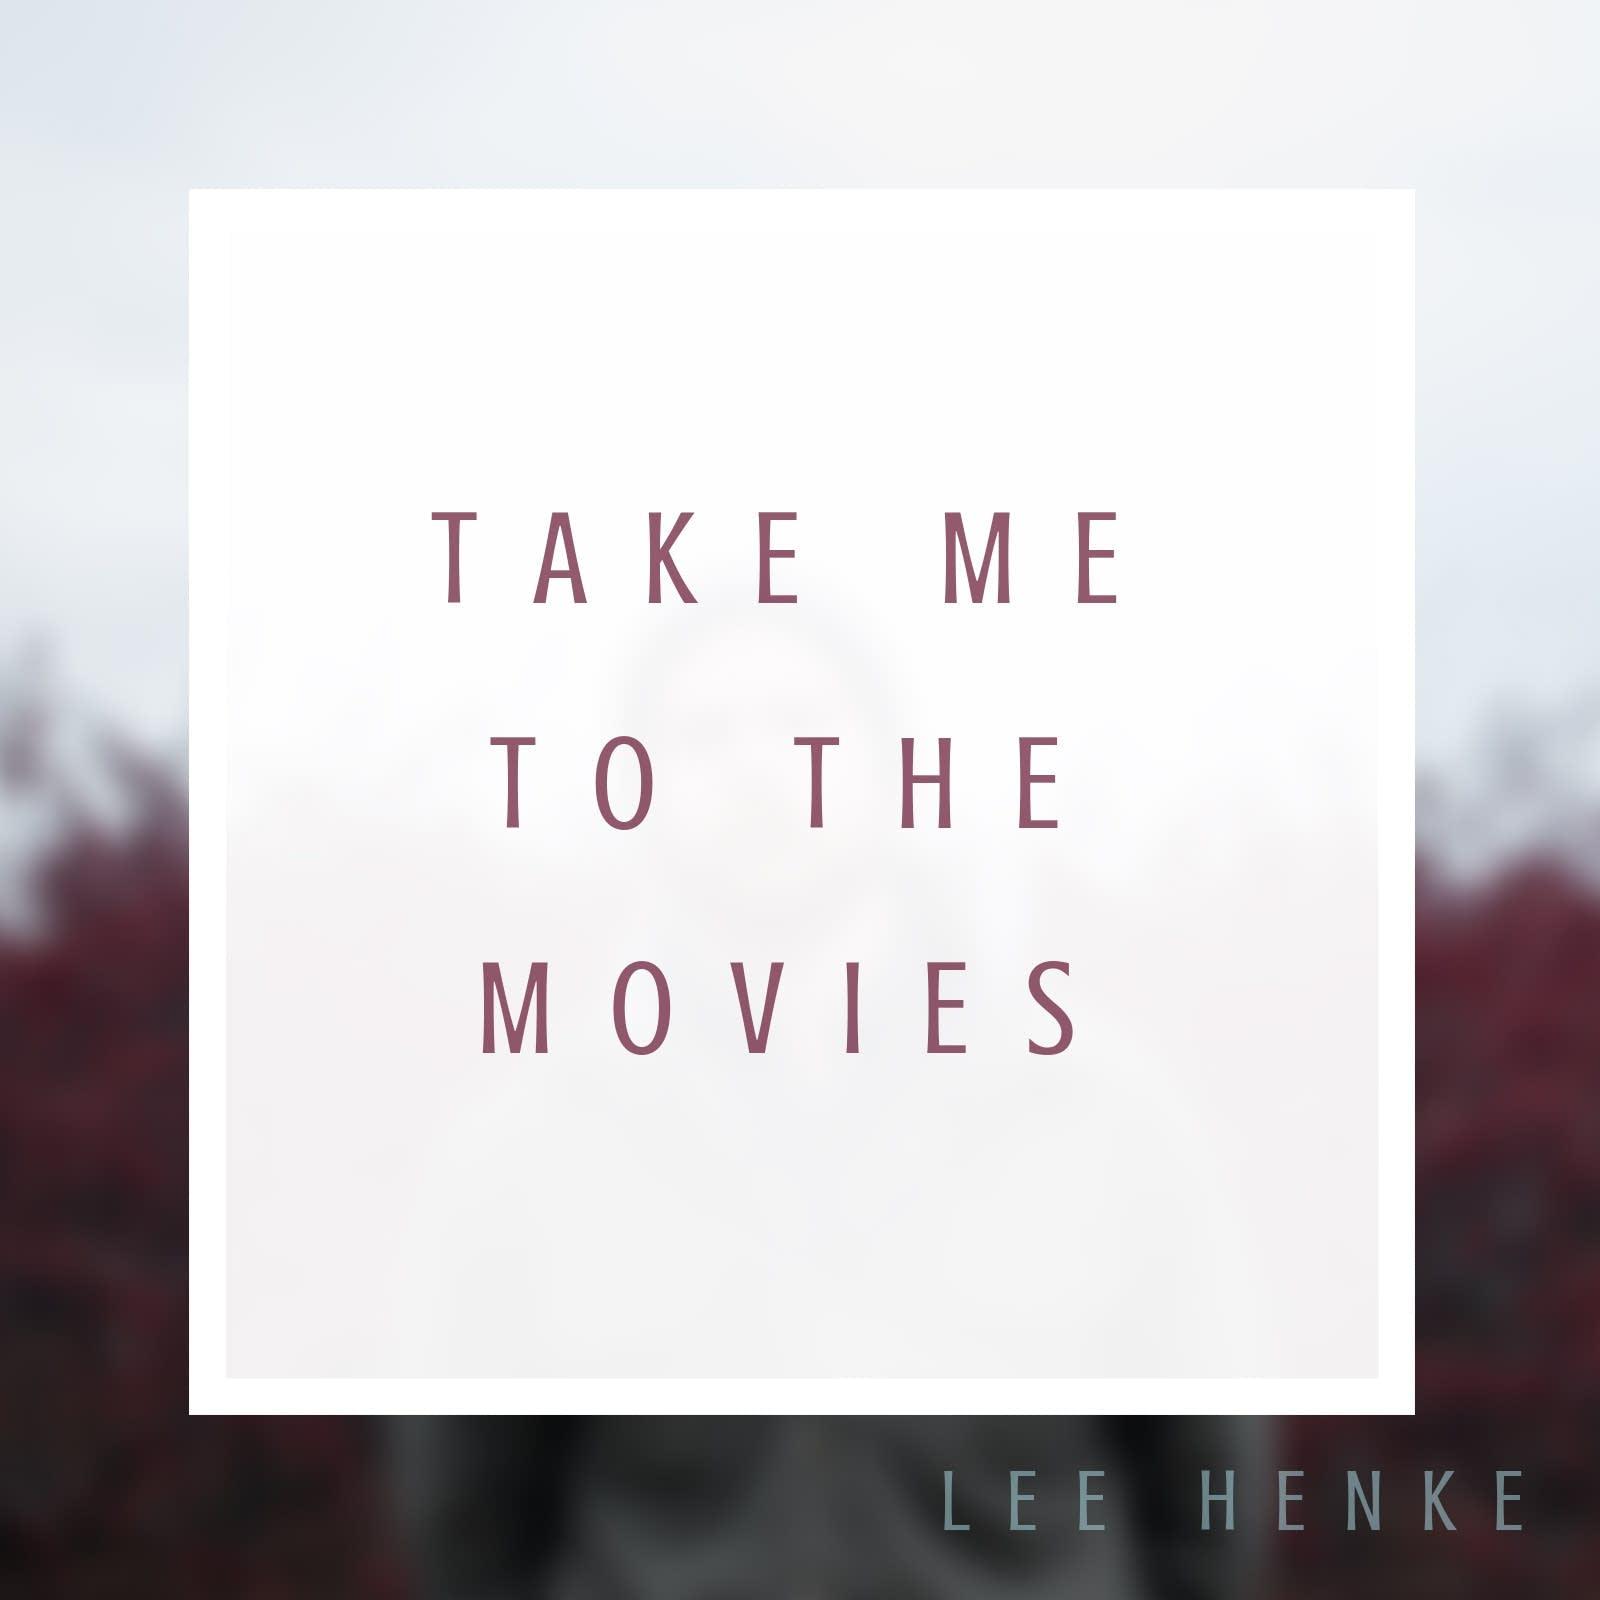 Lee Henke, 'Take Me To The Movies' single artwork